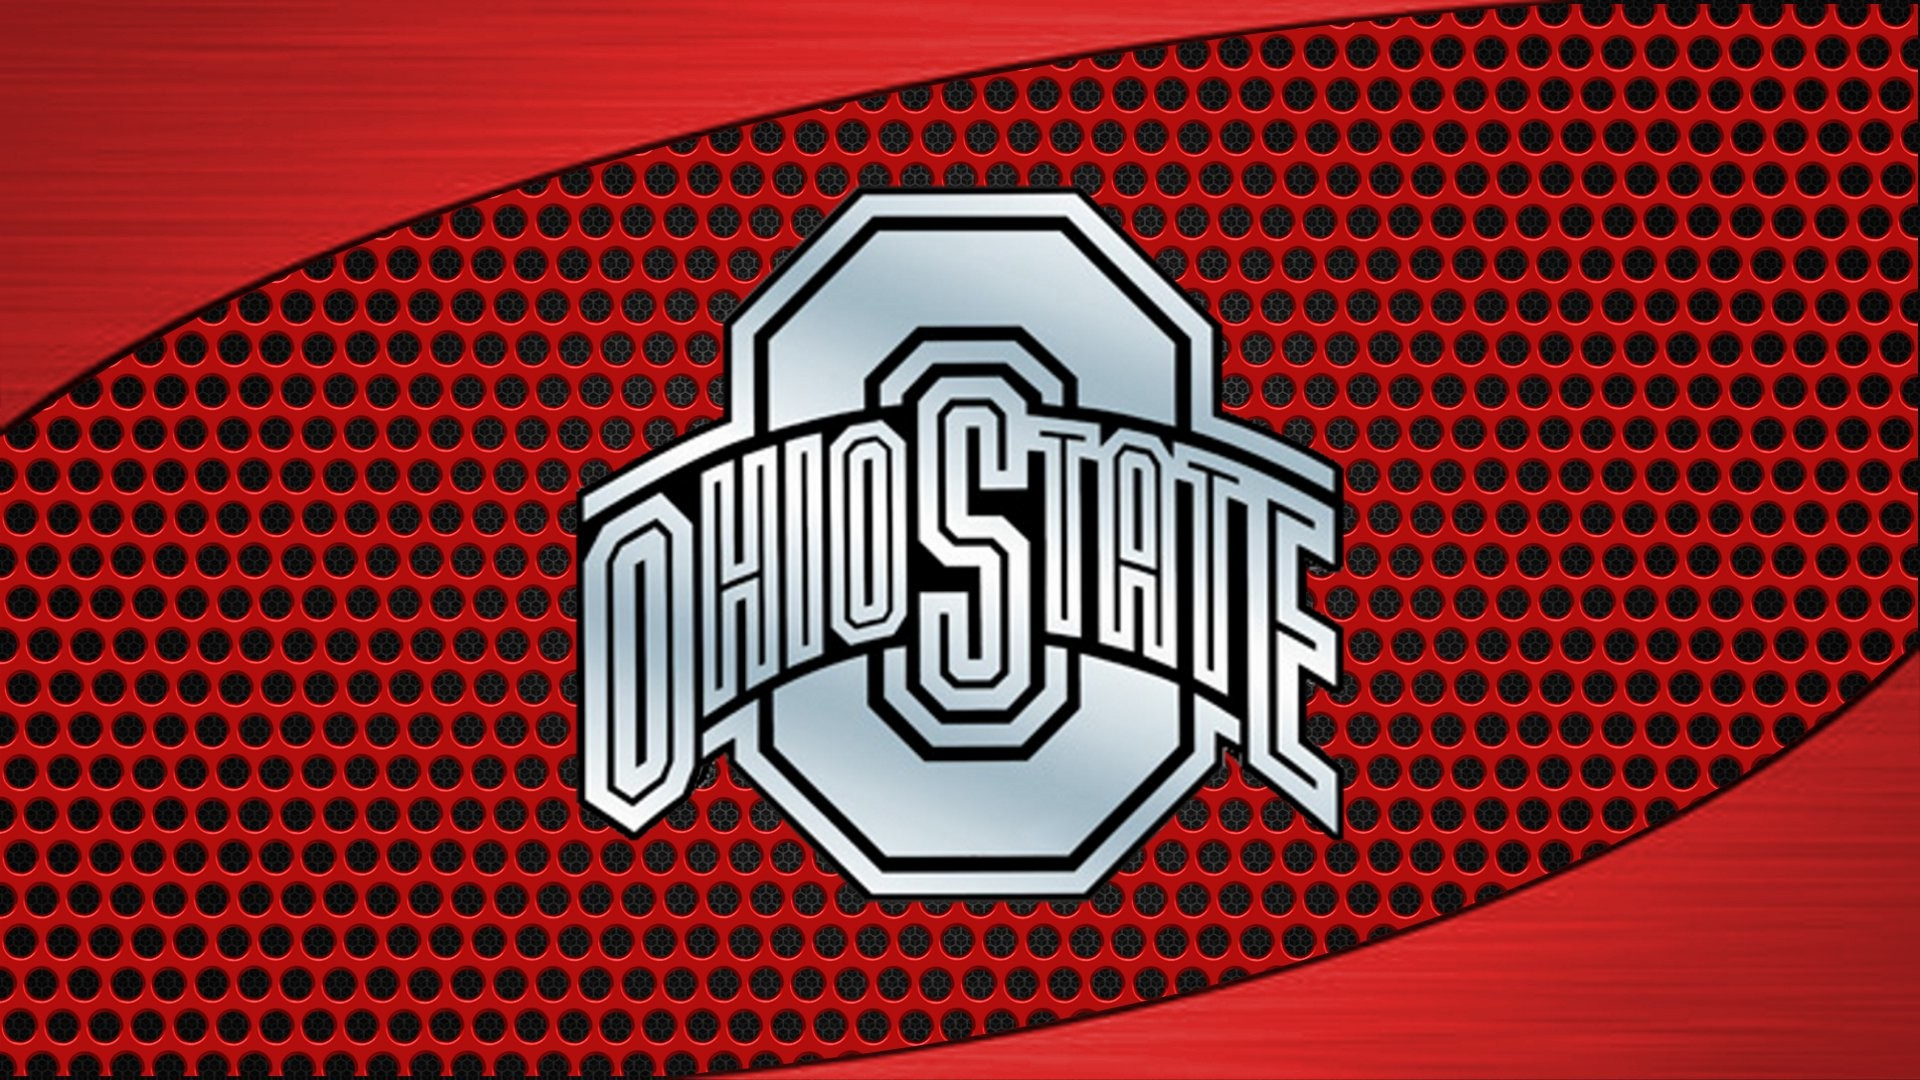 OSU Wallpaper 333 – Ohio State Football Wallpaper (29289012) – Fanpop